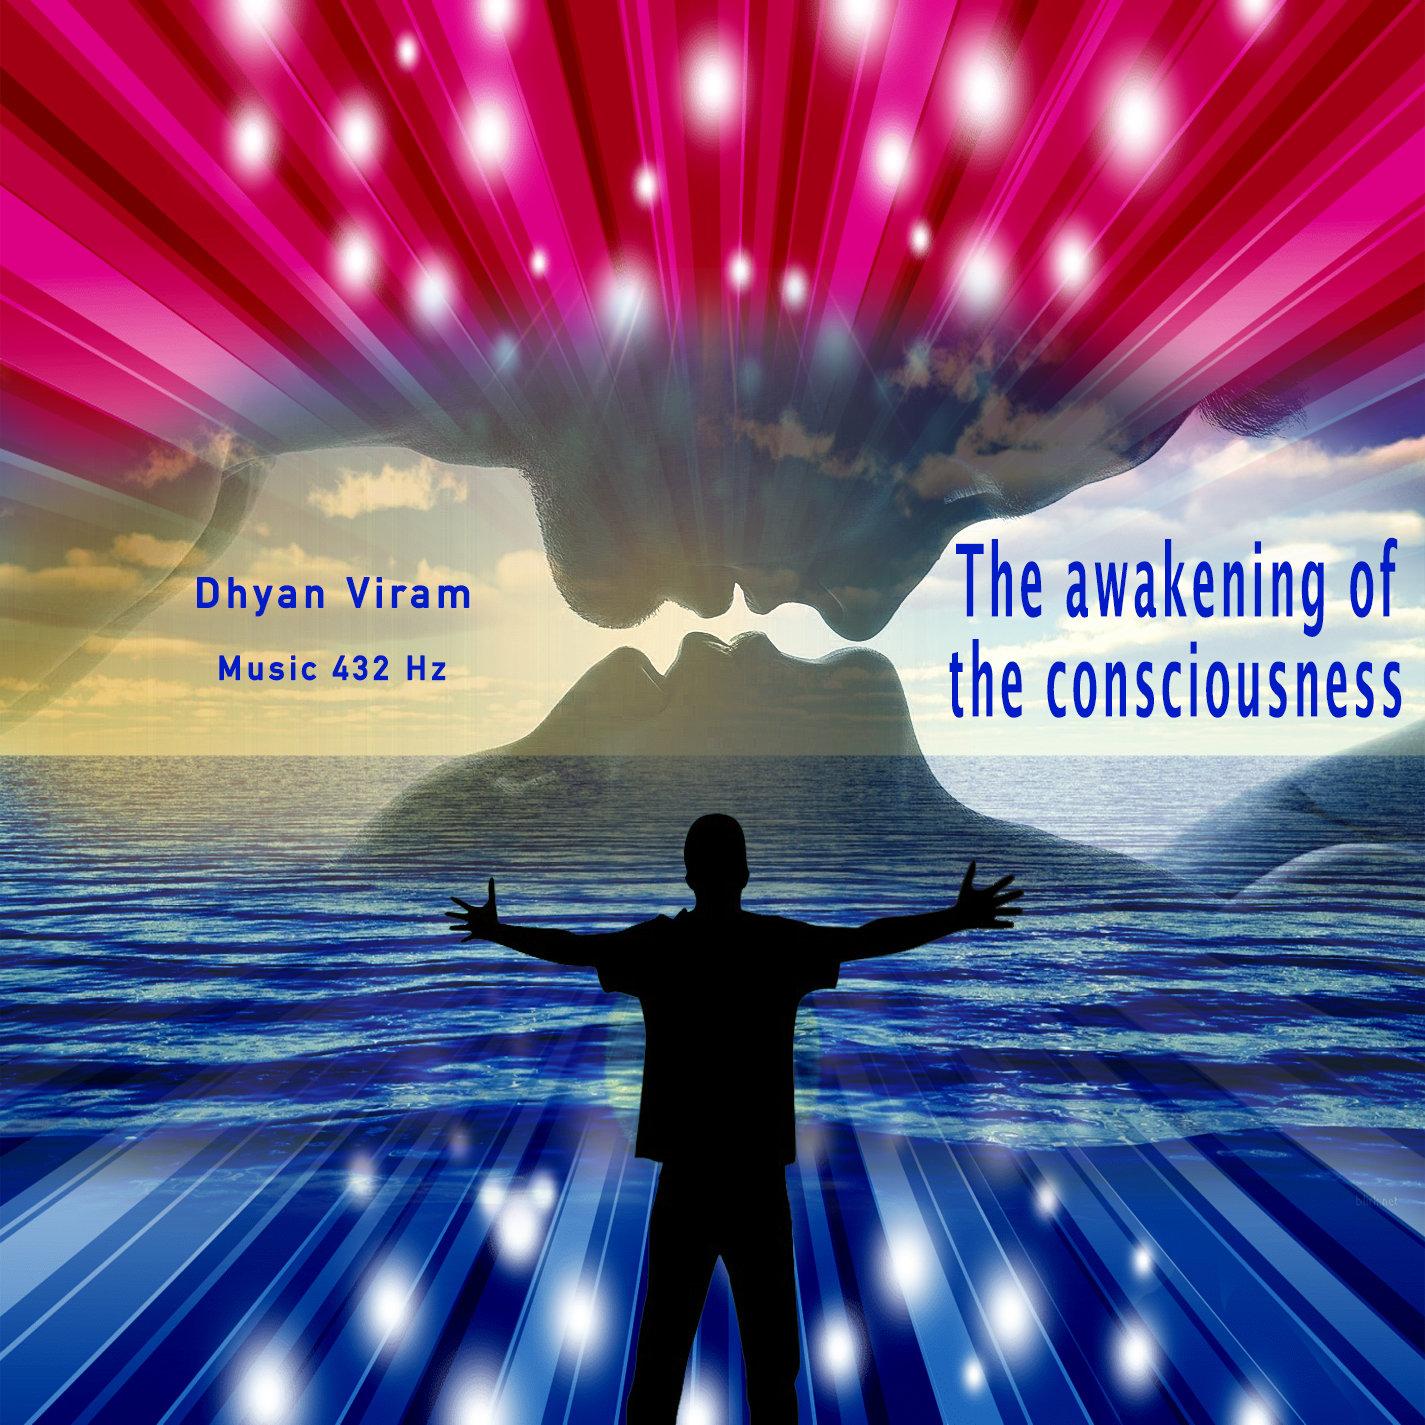 The awakening of the consciousness